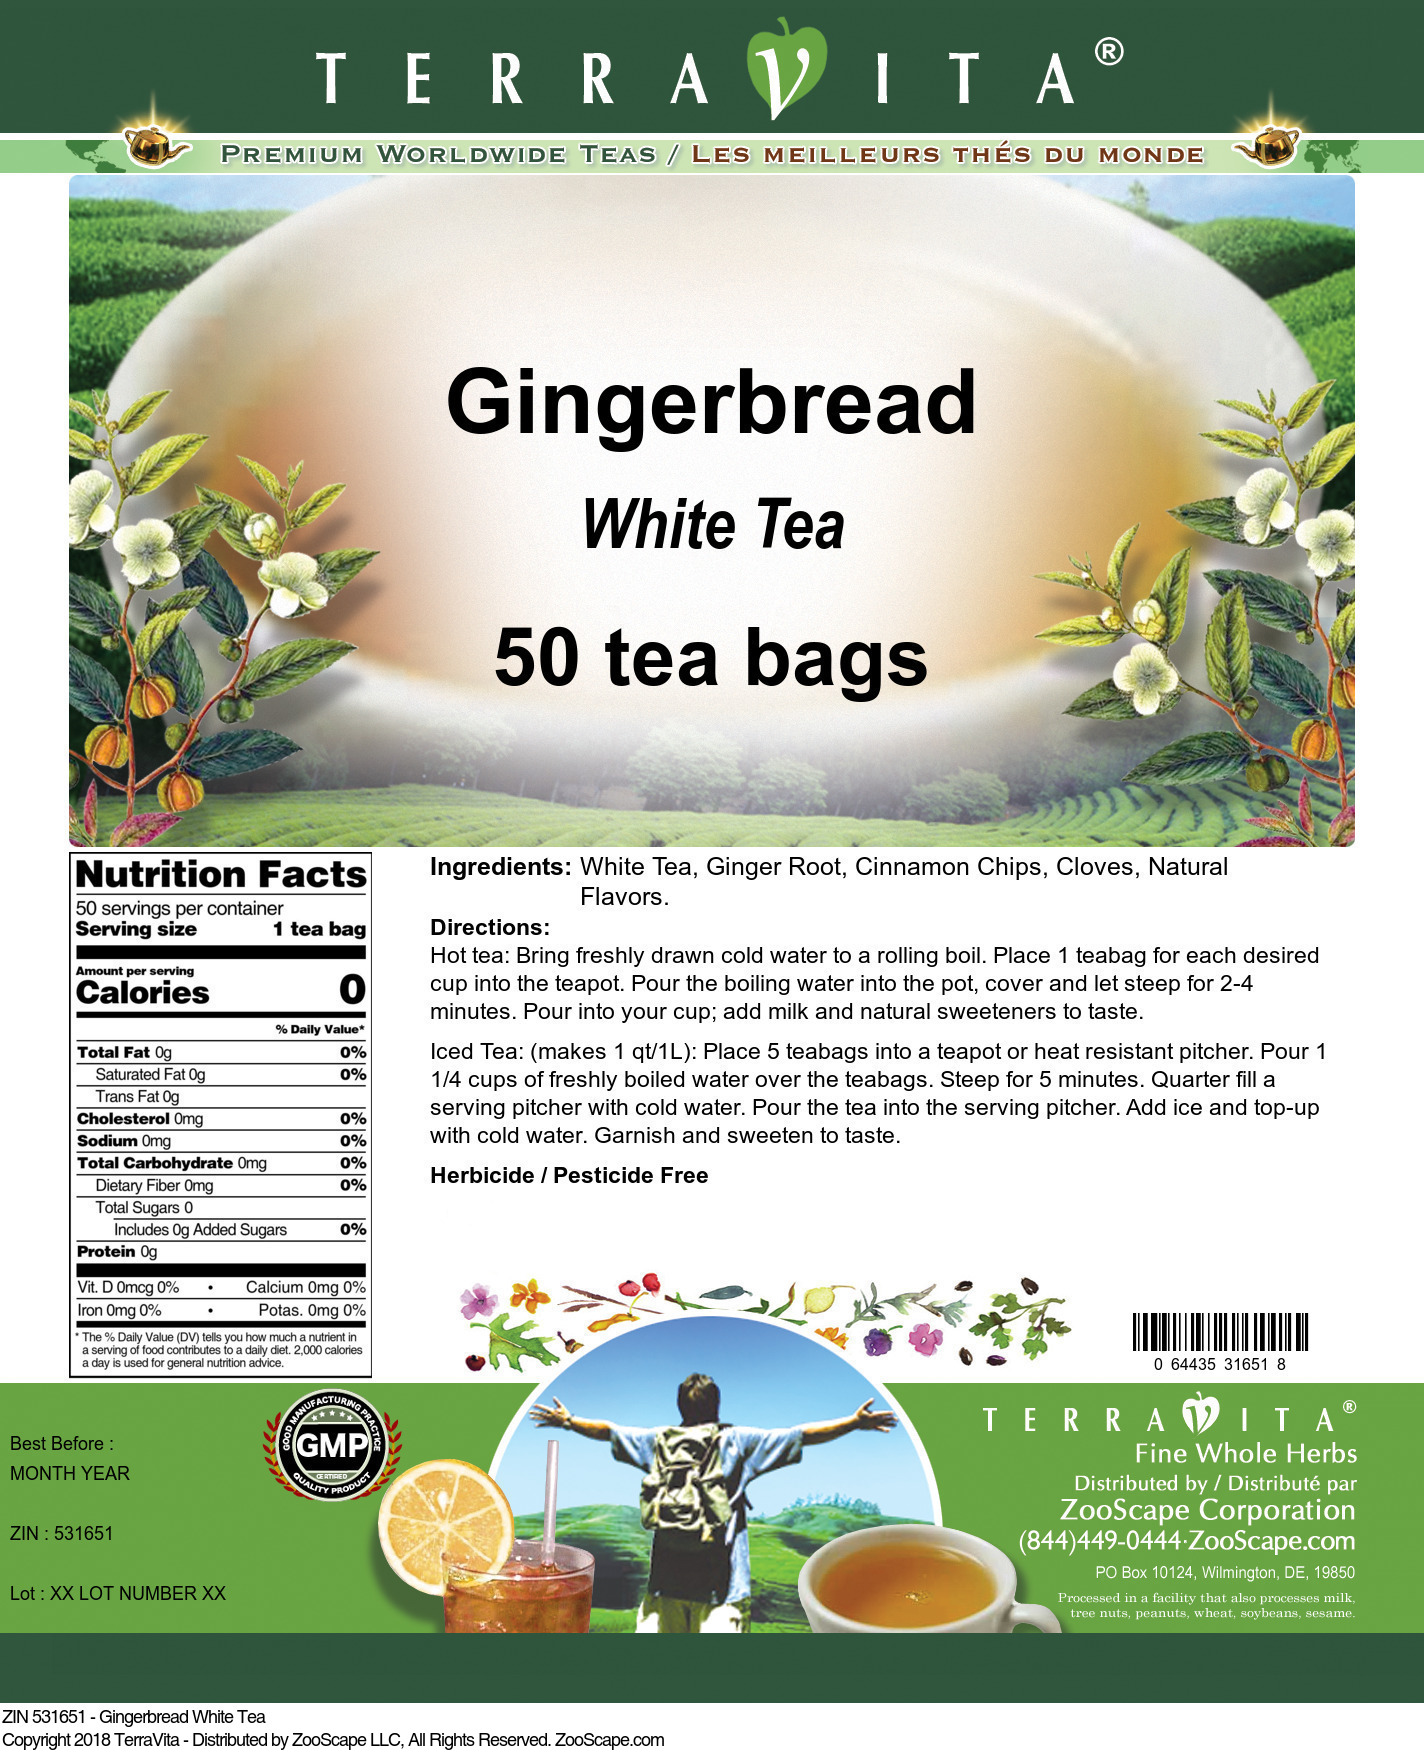 Gingerbread White Tea